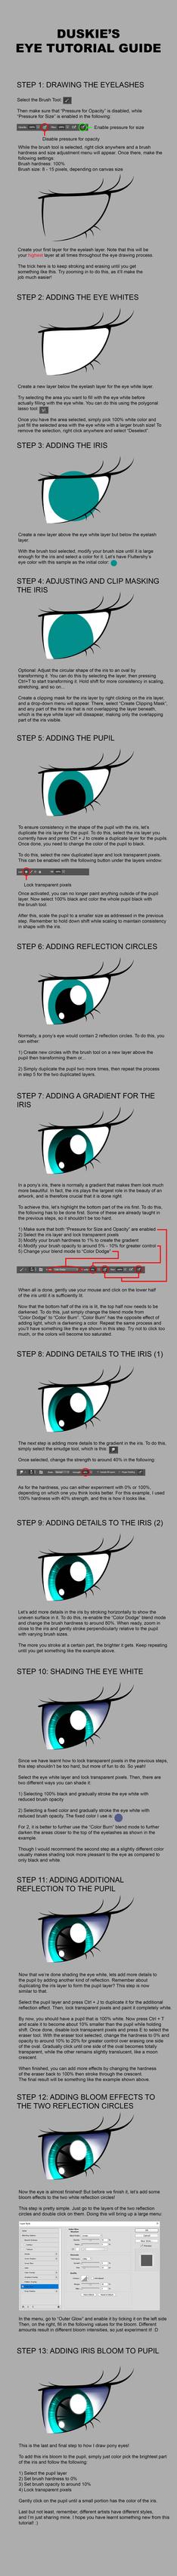 Step by step eye tutorial by Duskie-06